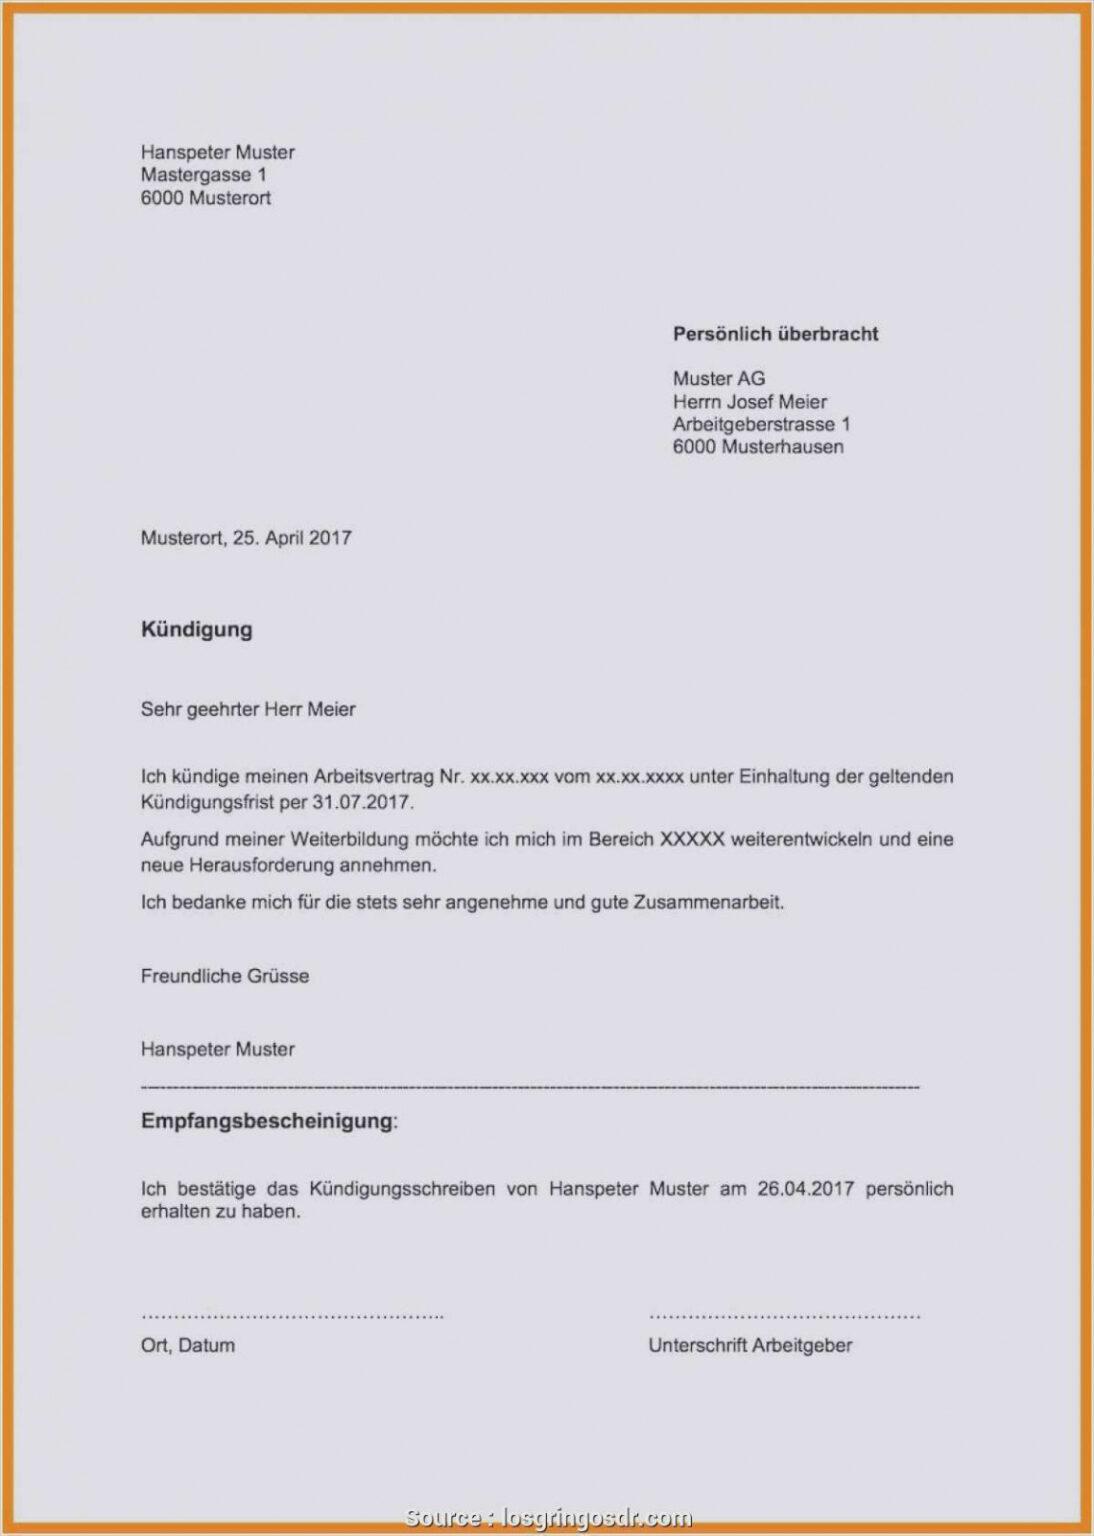 Sampler Bürgschaft Wg Eltern Vorlage Doc Frei - Casagenotta